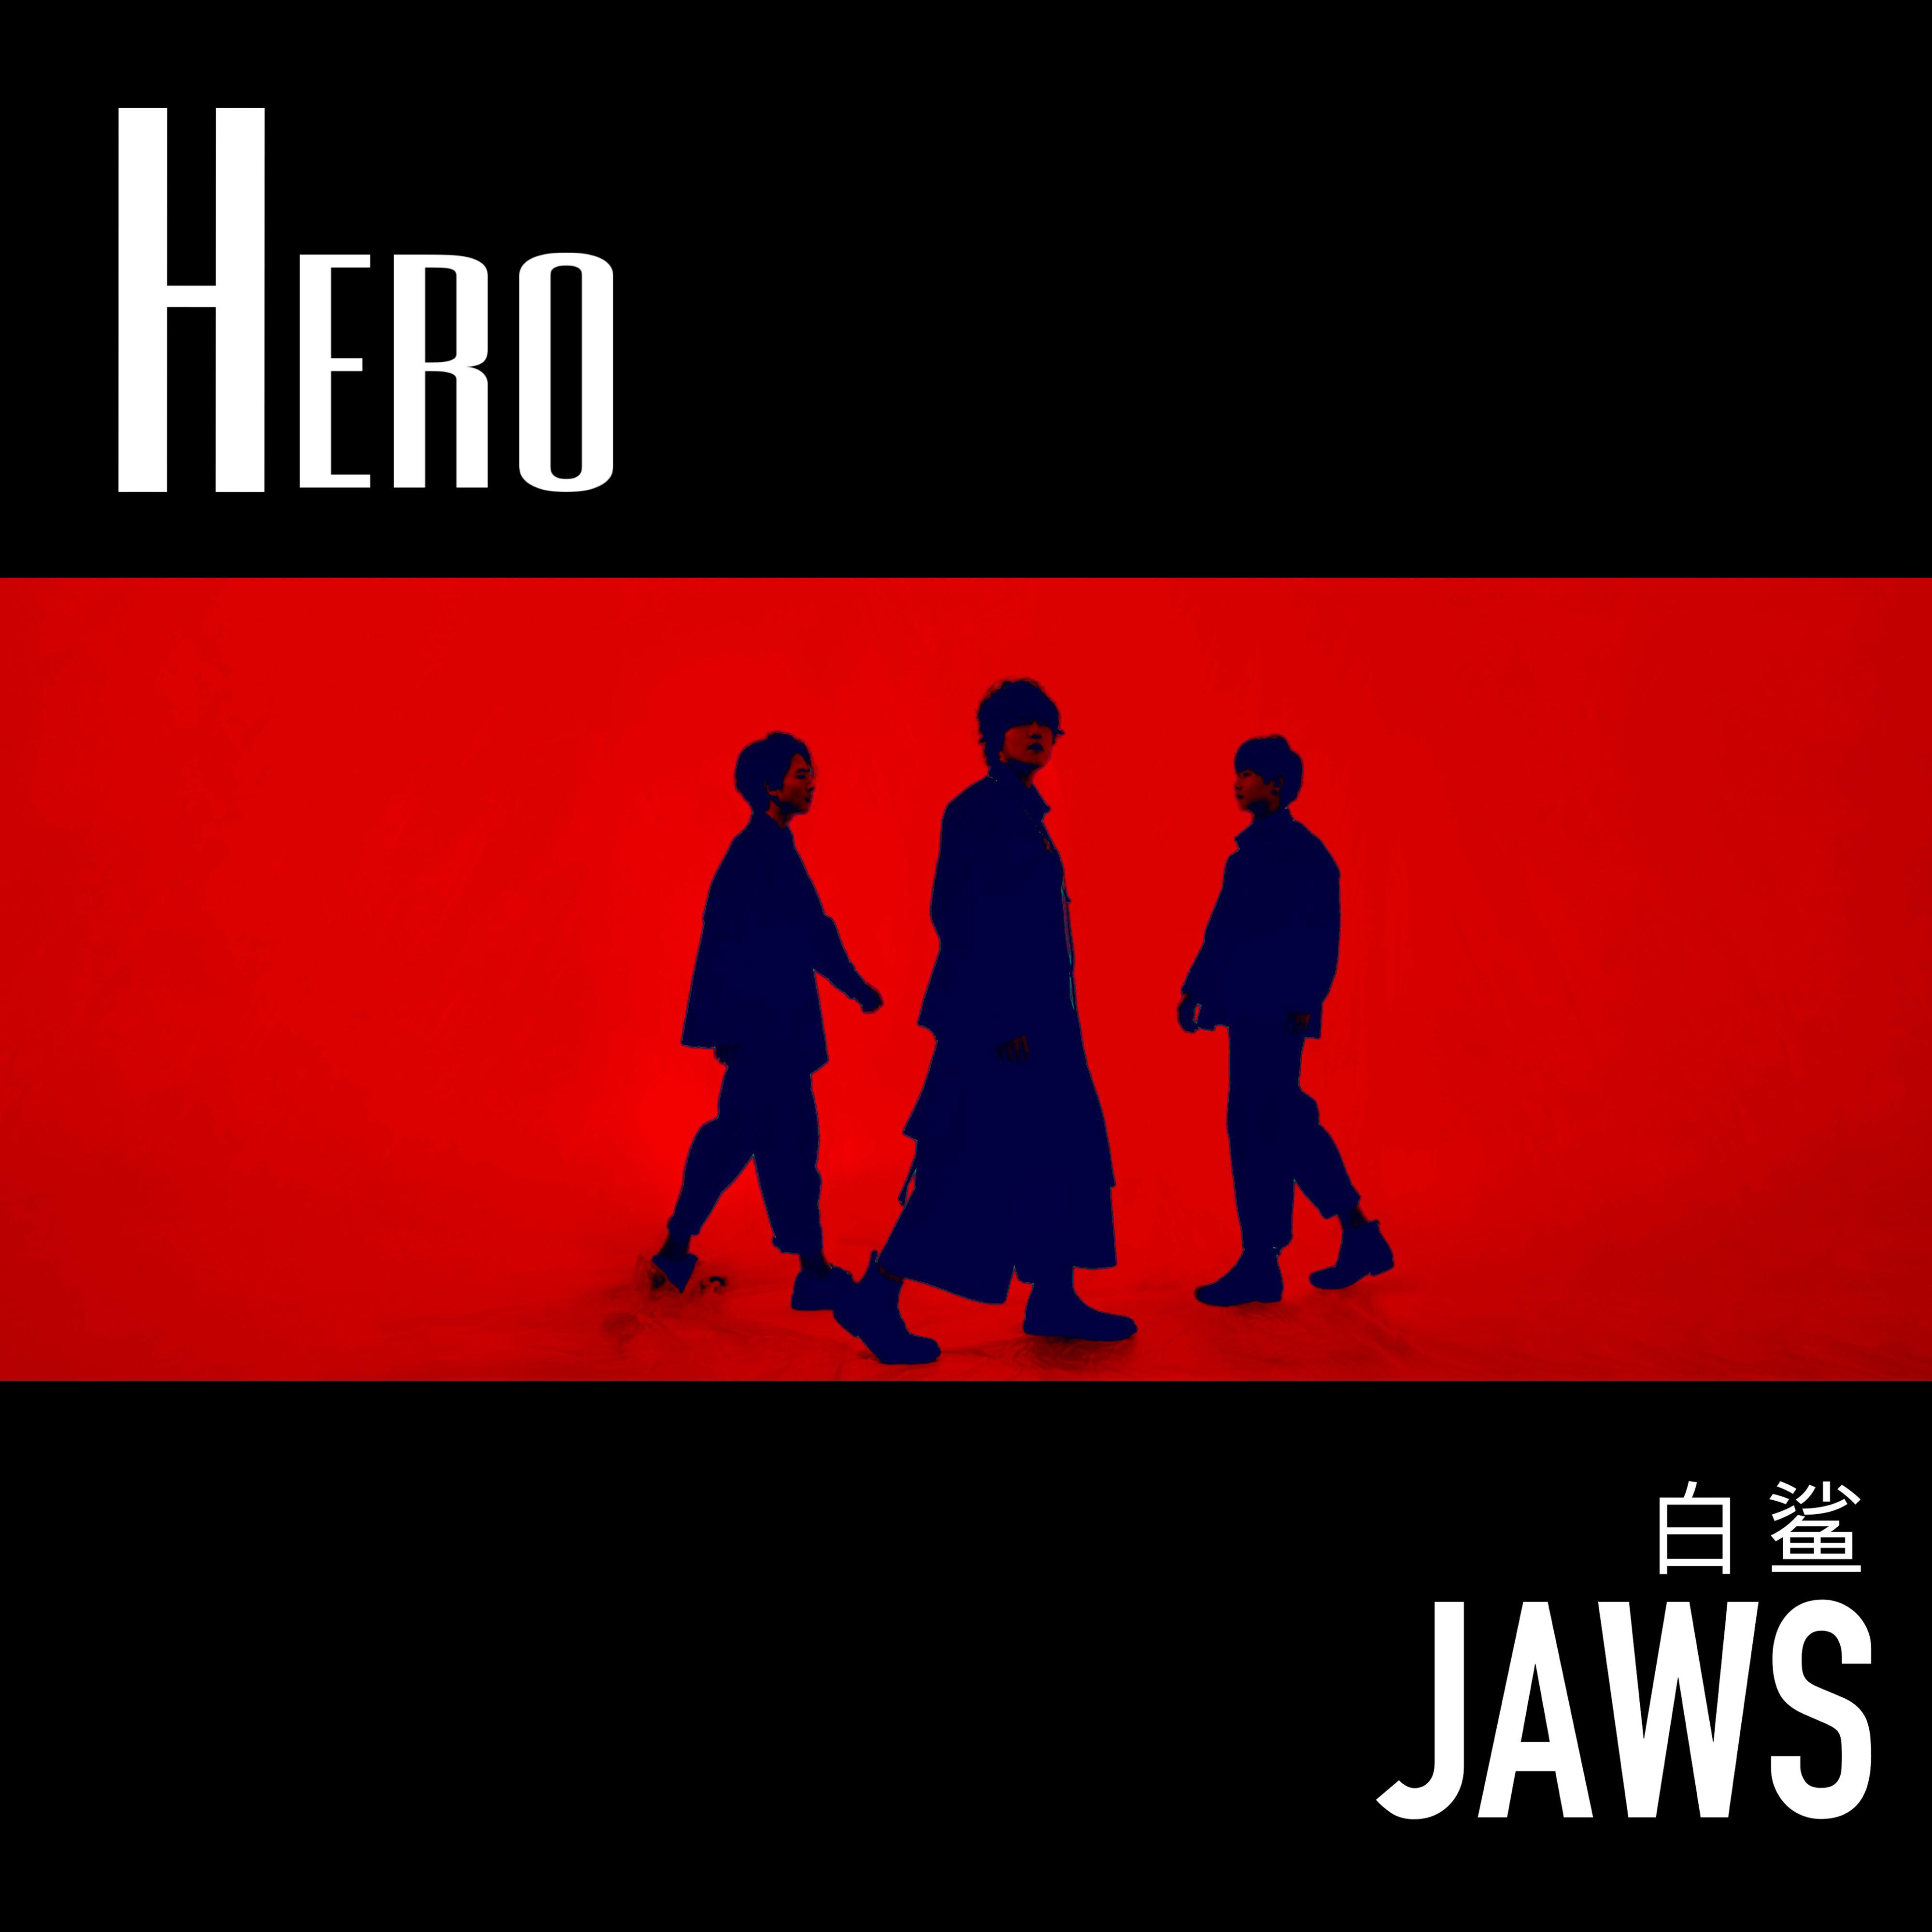 白鲨JAWS乐队原创EP《HERO》全新发布